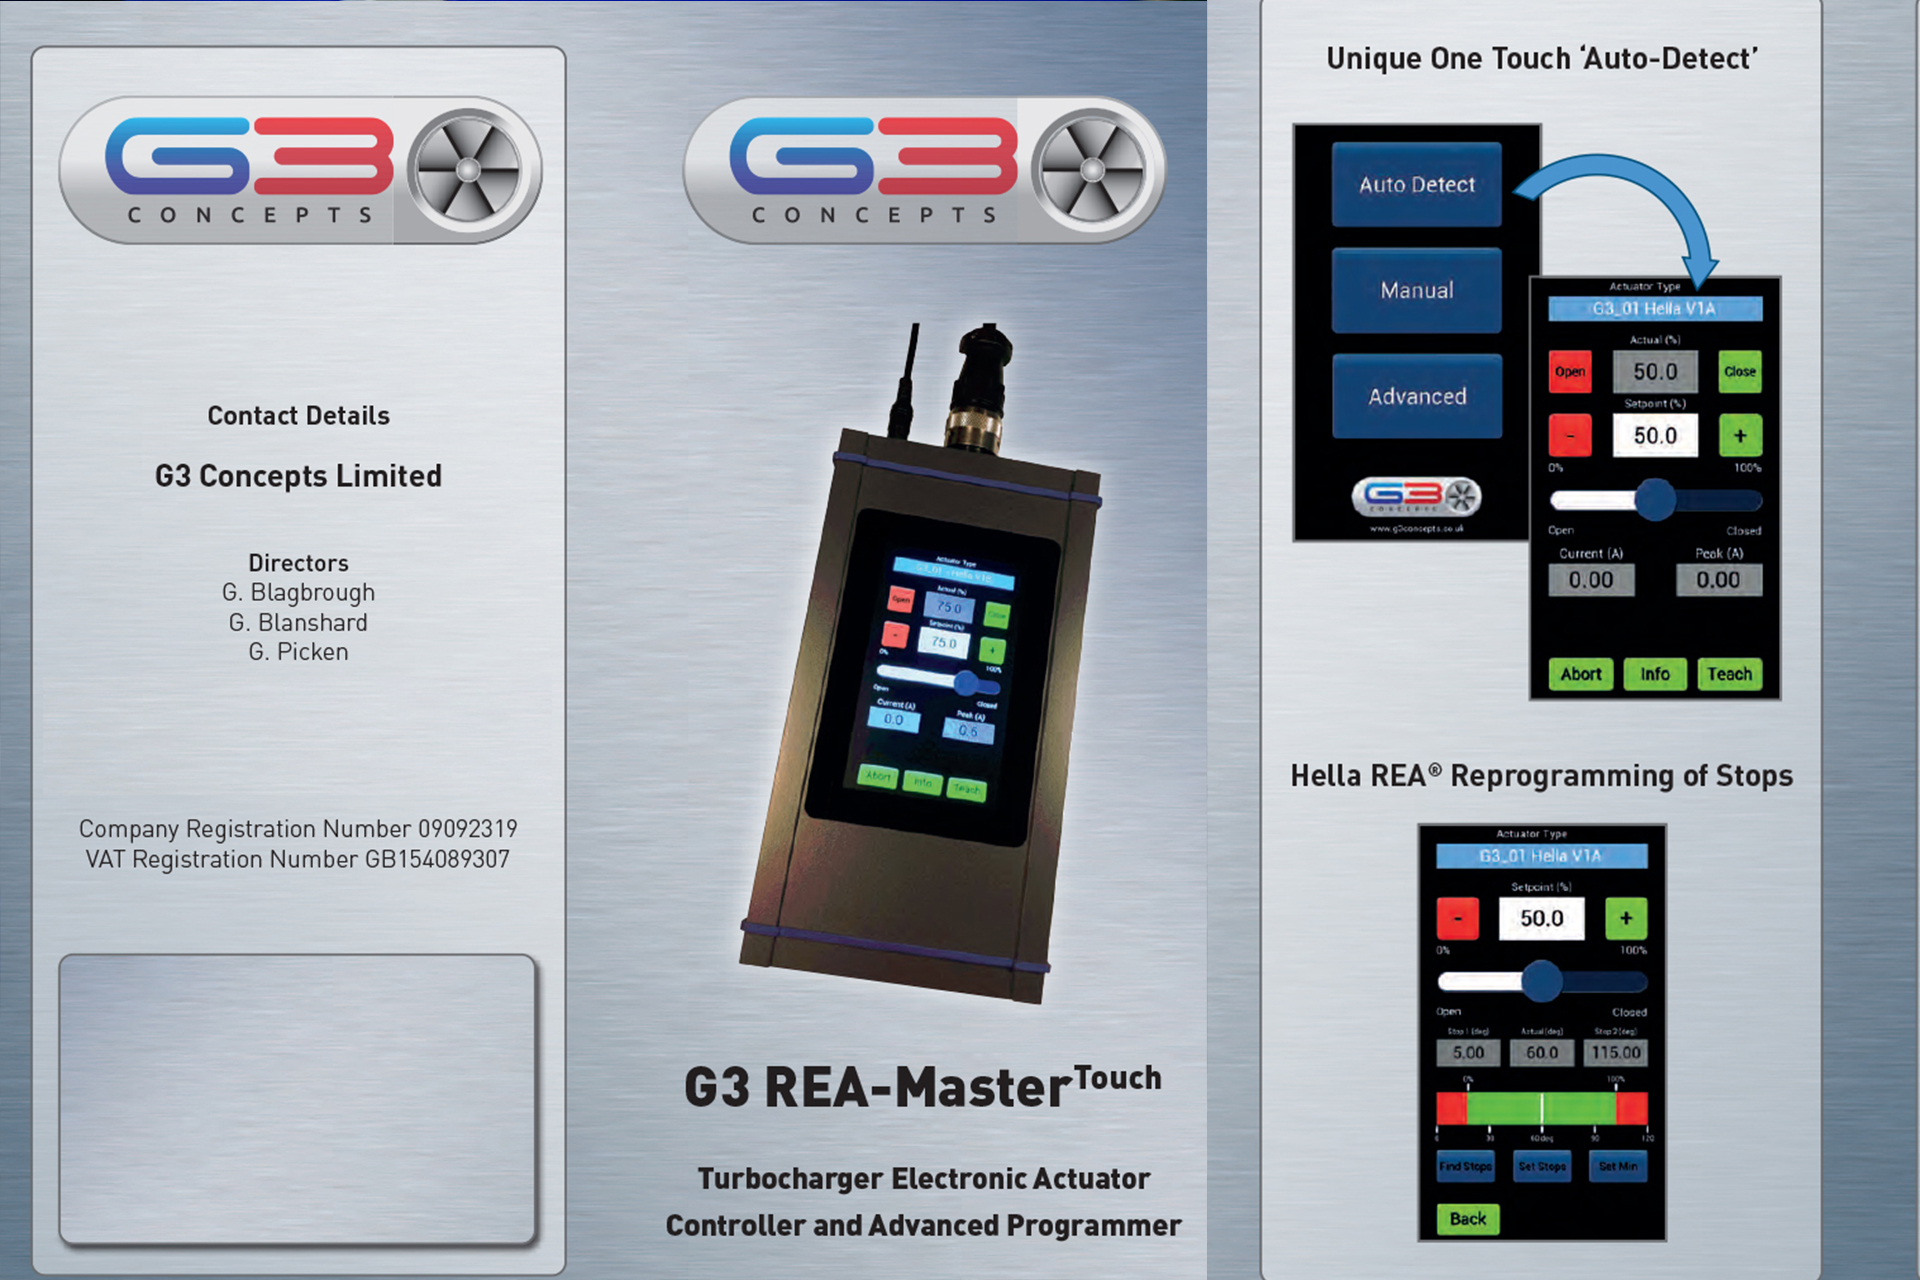 G3 REA-MasterTouch